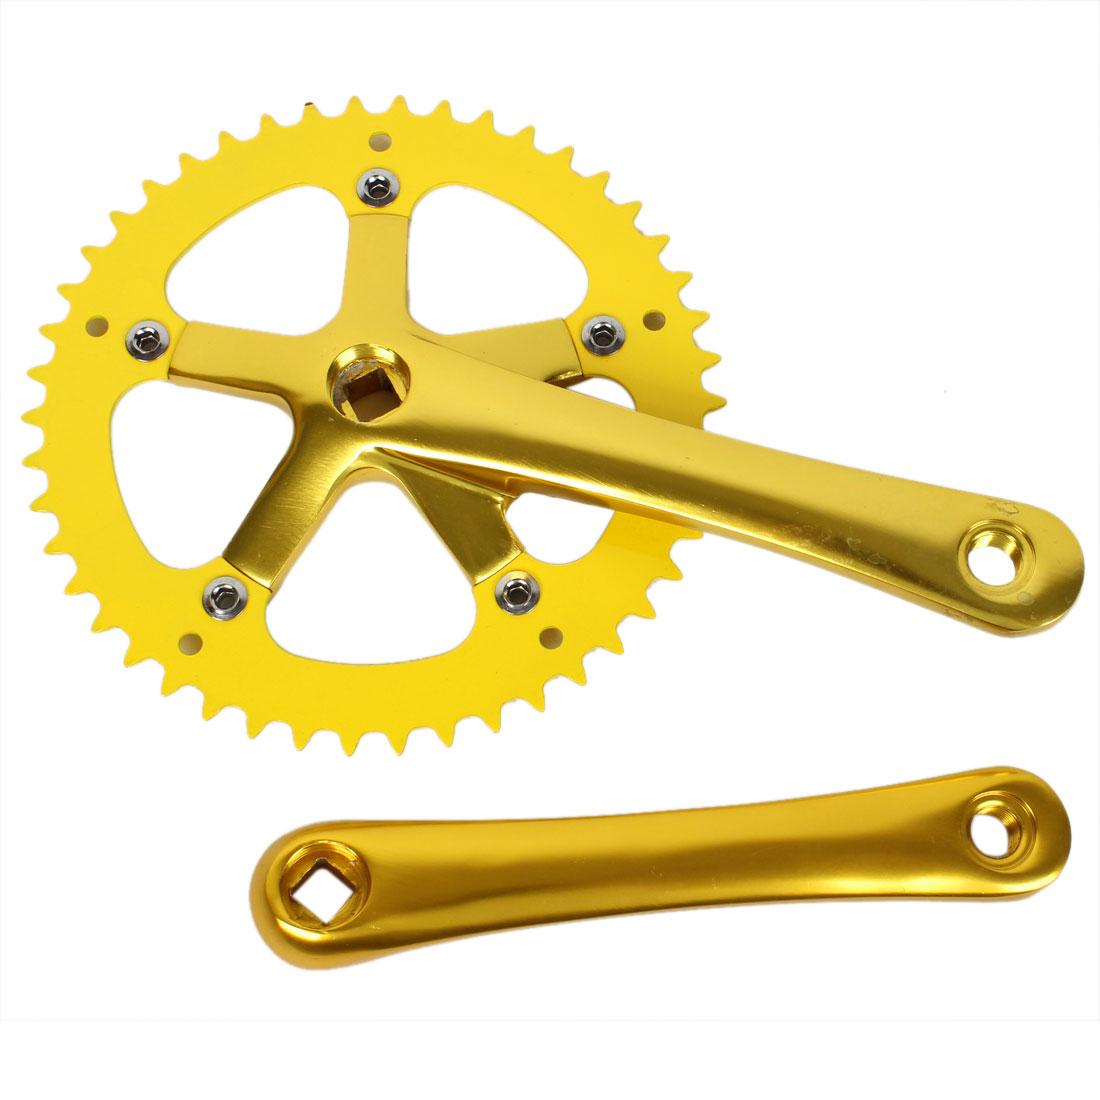 Bicycle Bike 46 Teeth Chain Wheel Front Crankset Gold Tone 170mm Dia